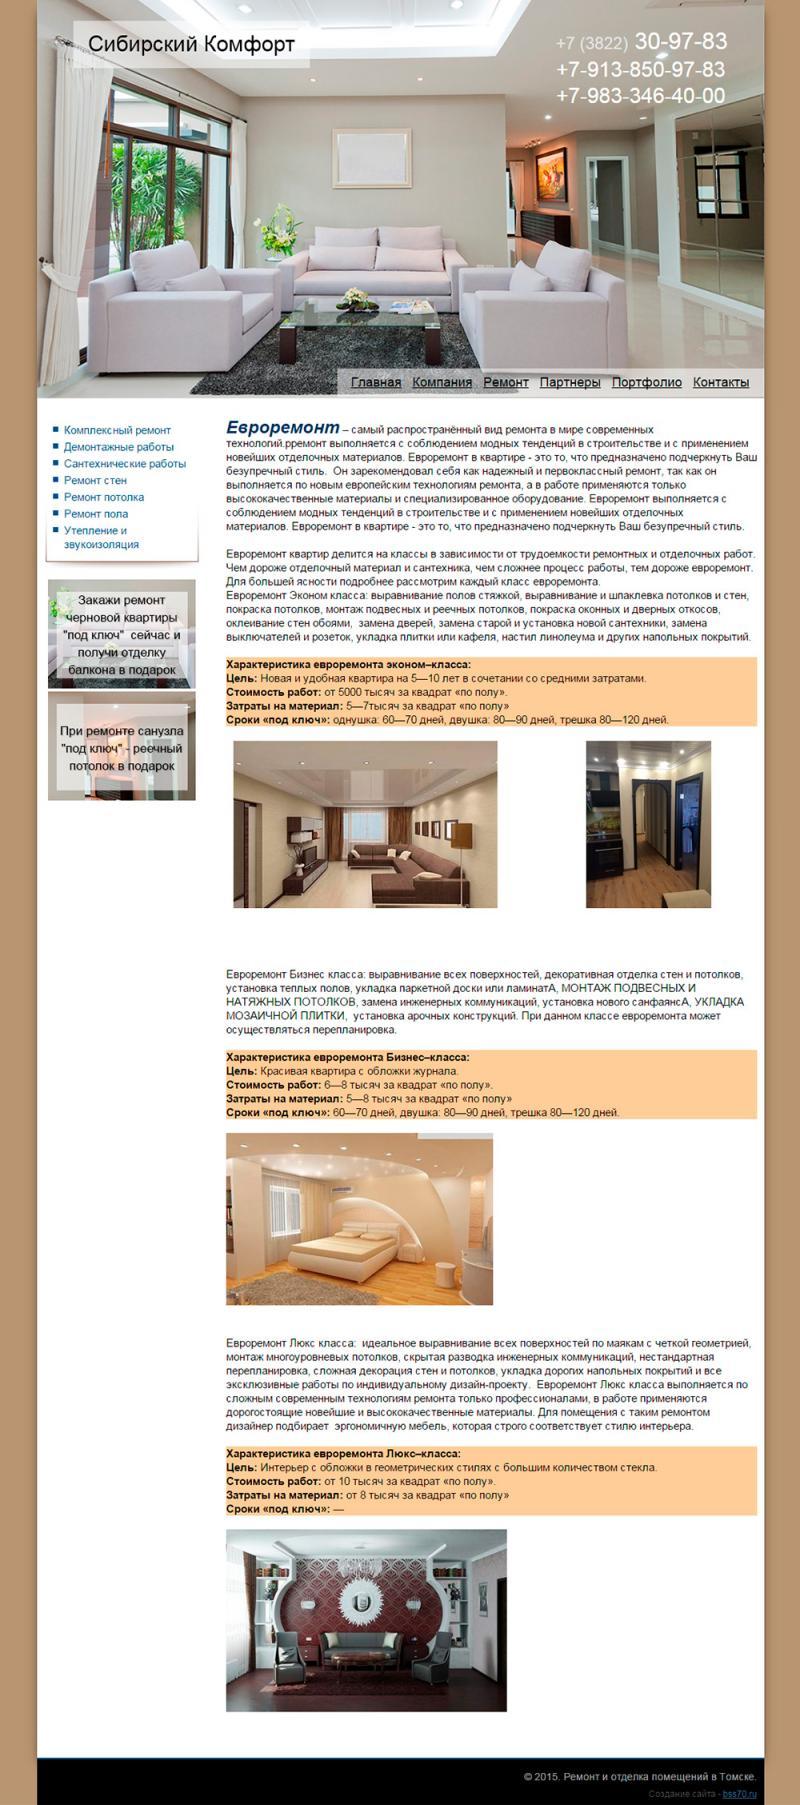 Сибирский комфорт (сайт)